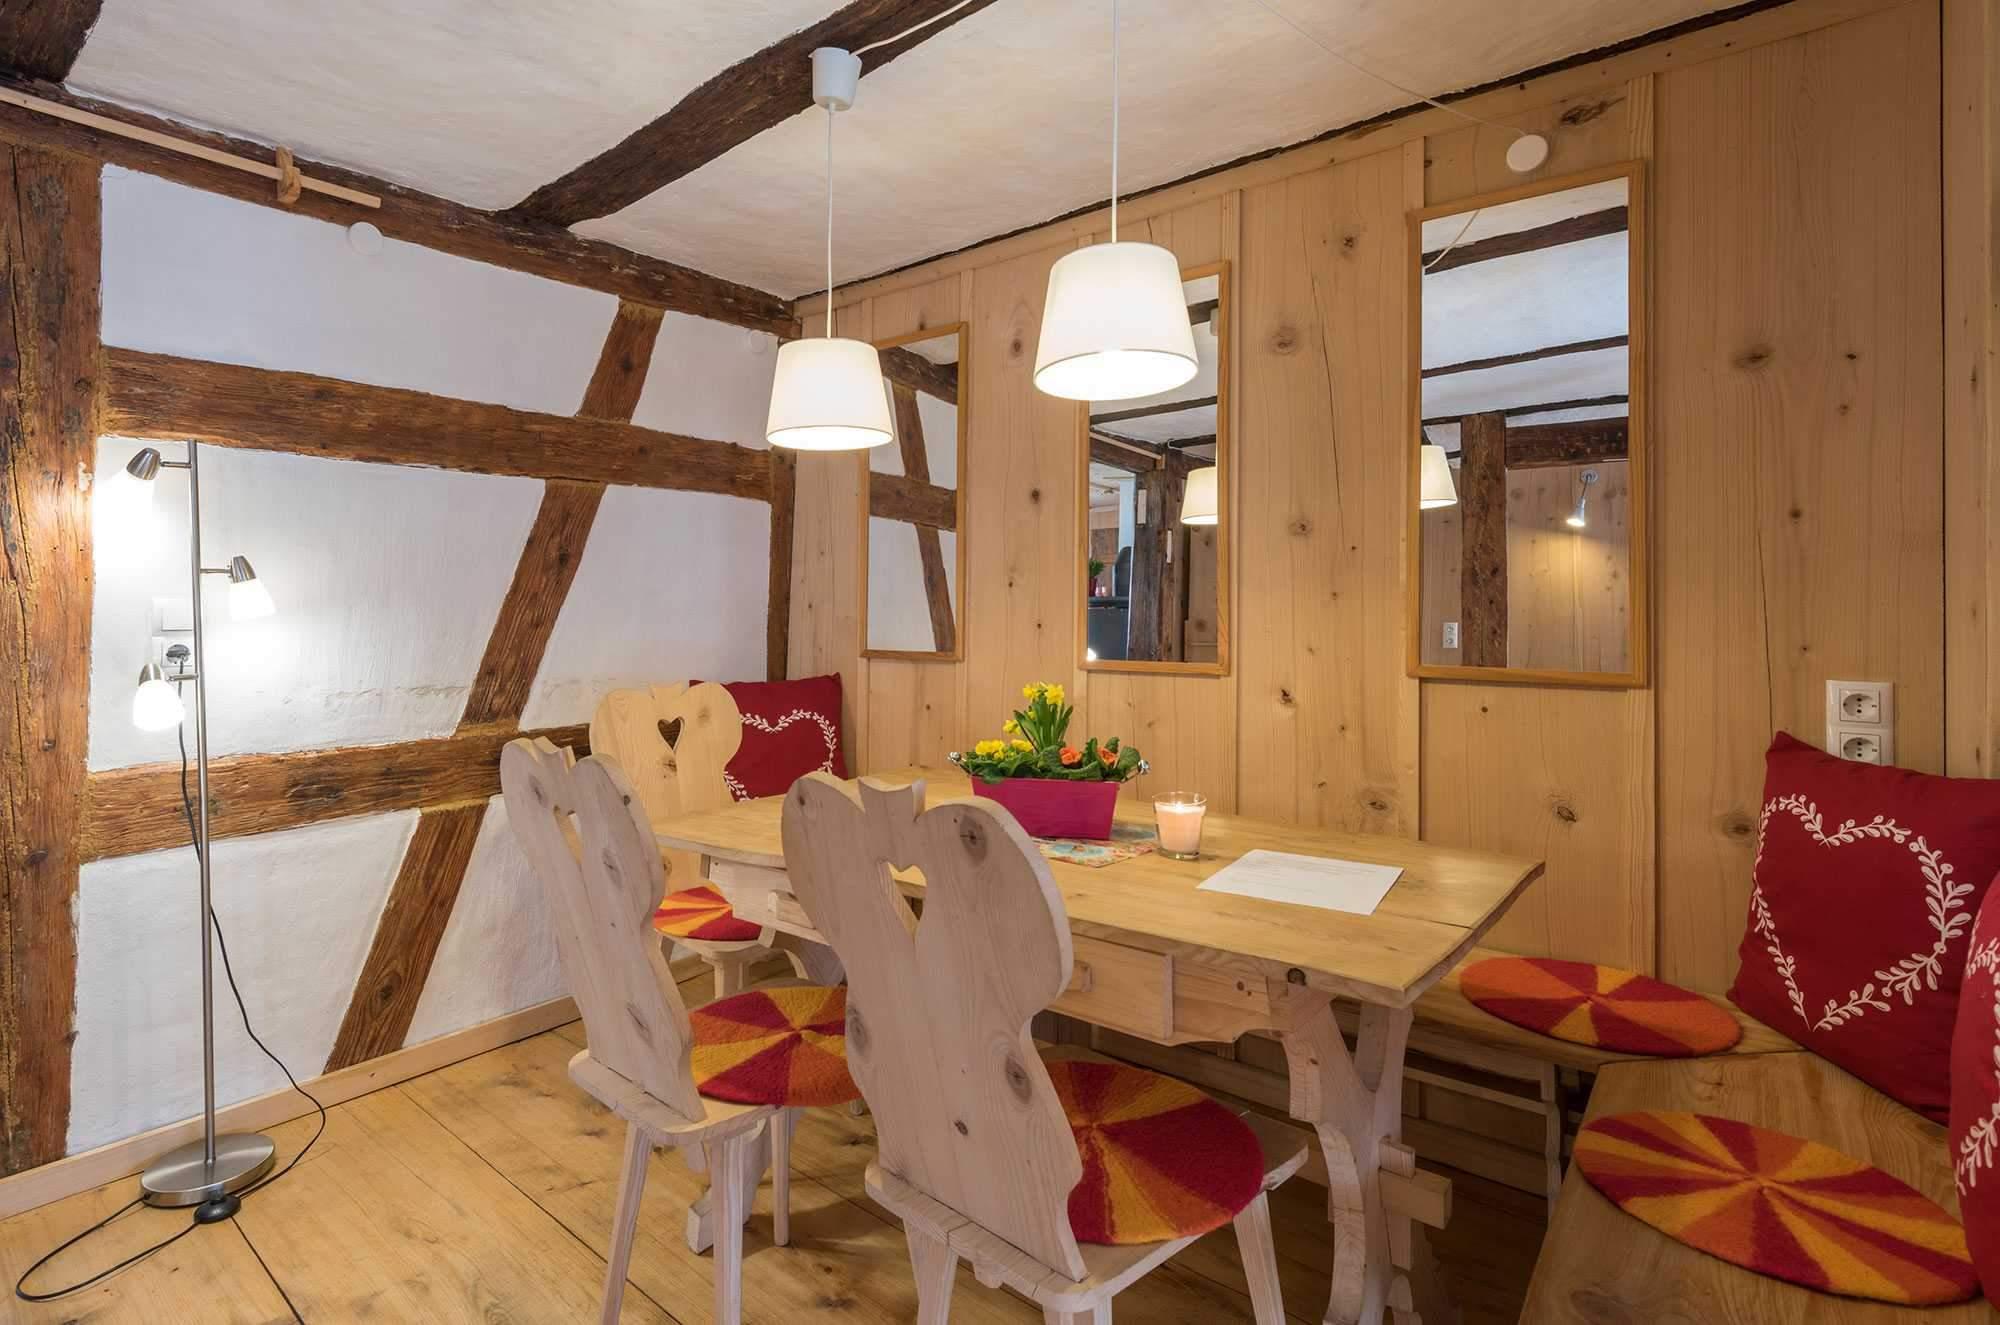 historisches ferienhaus gerberhaus im schwarzwald